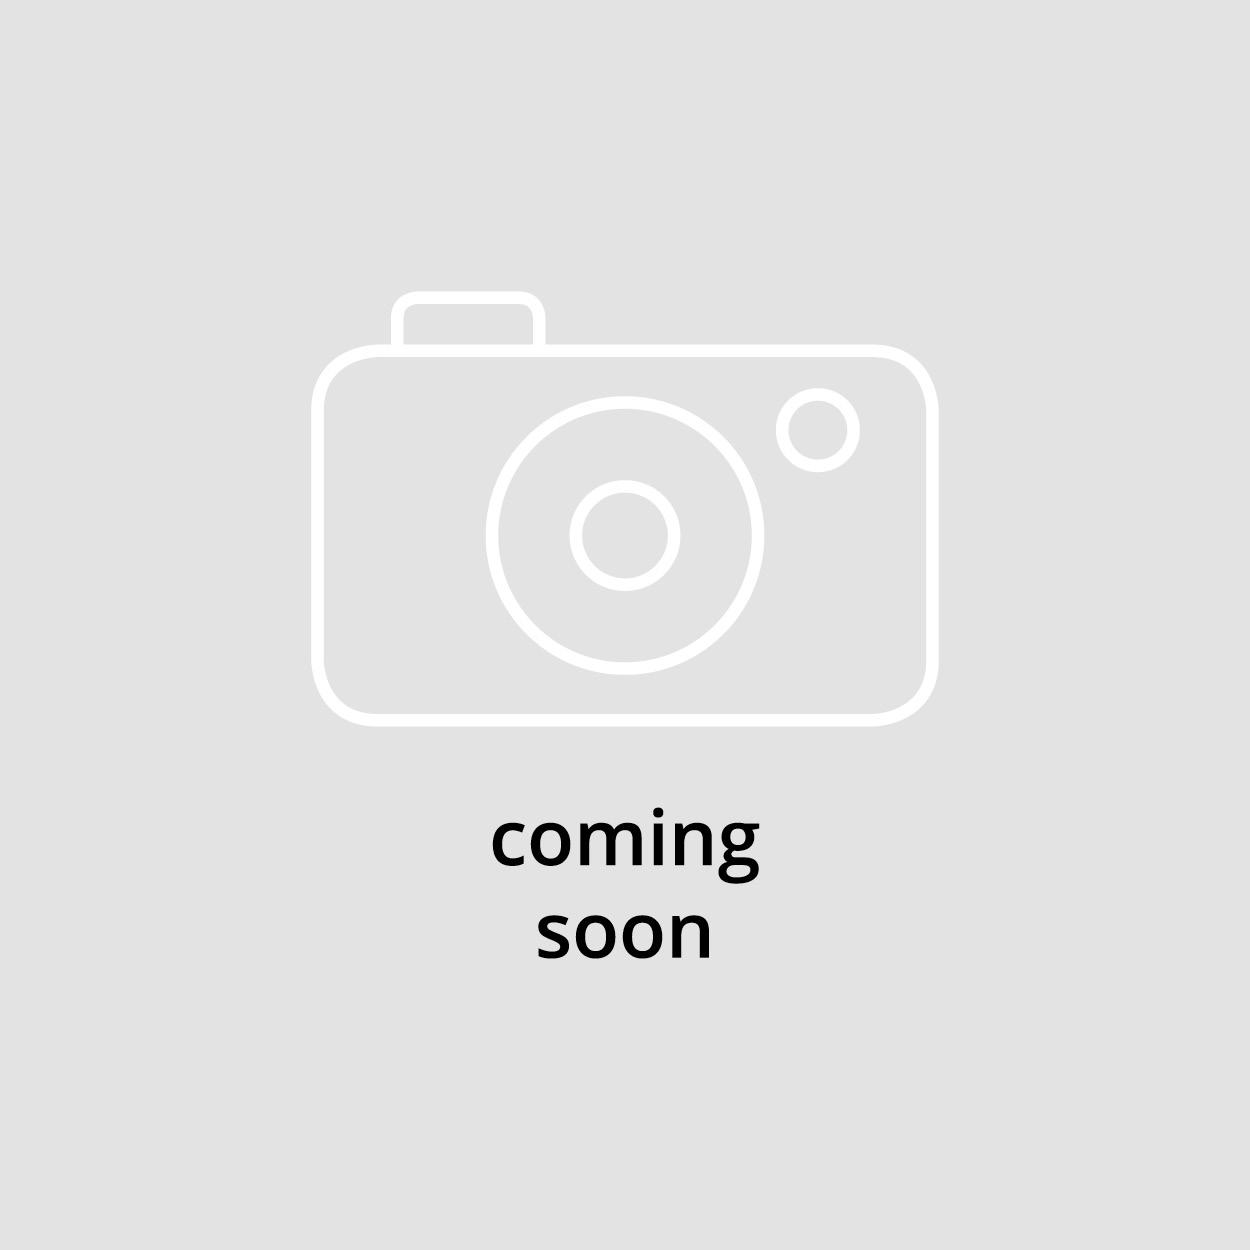 Micrometro per esterni Serie MicroMet Plus